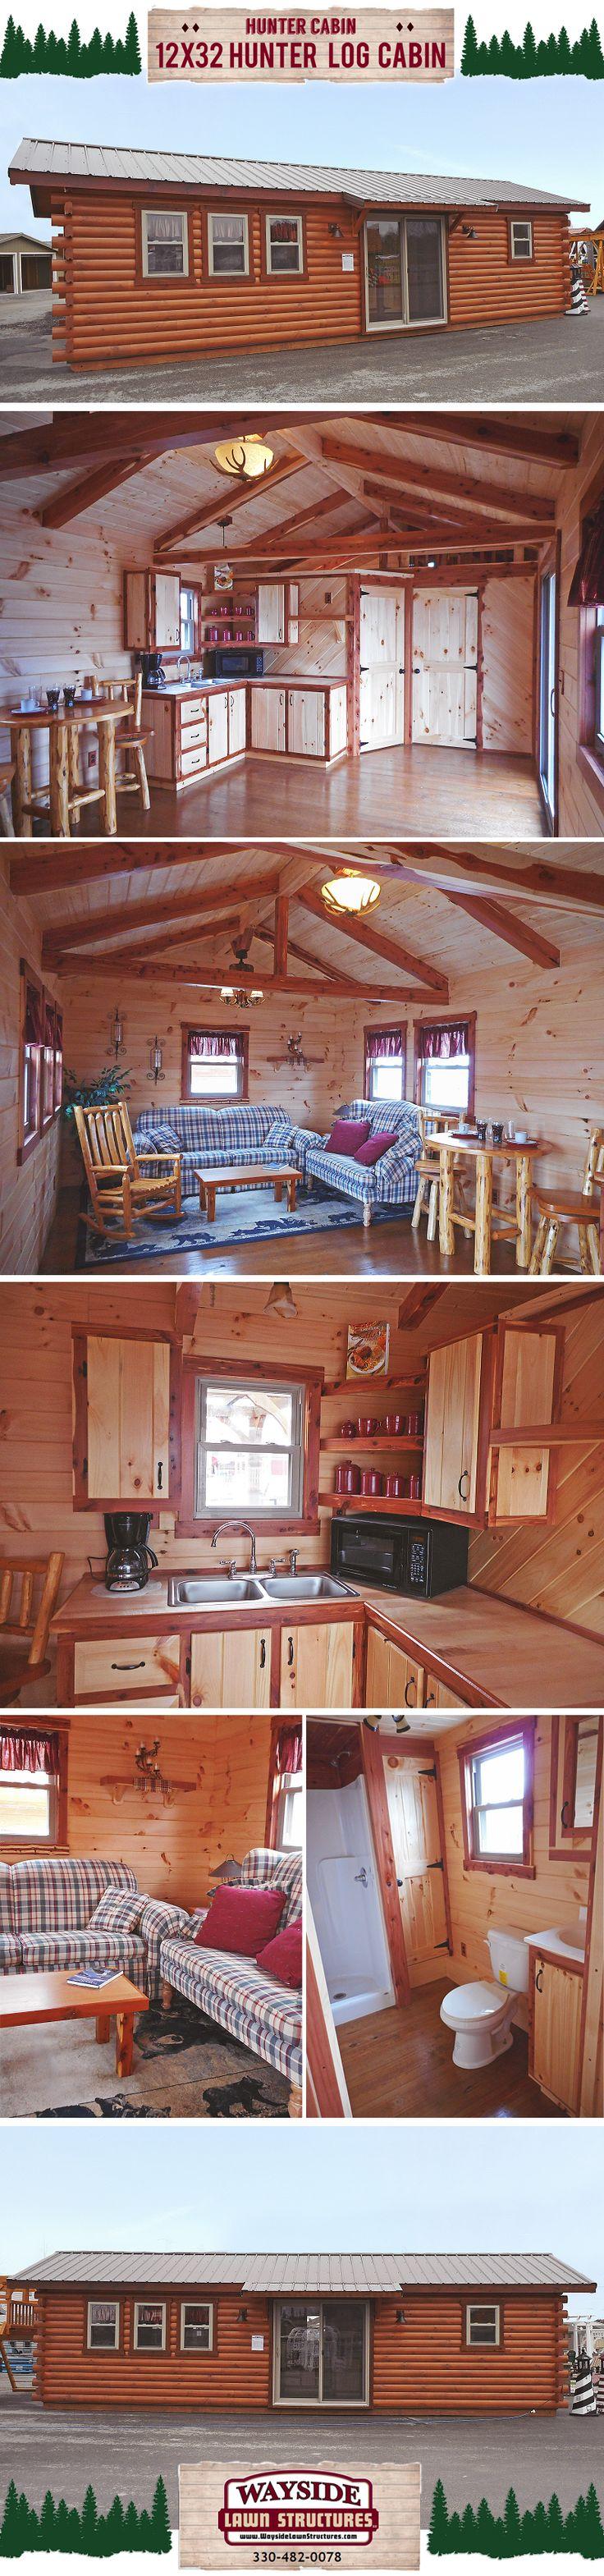 Model log homes in ohio